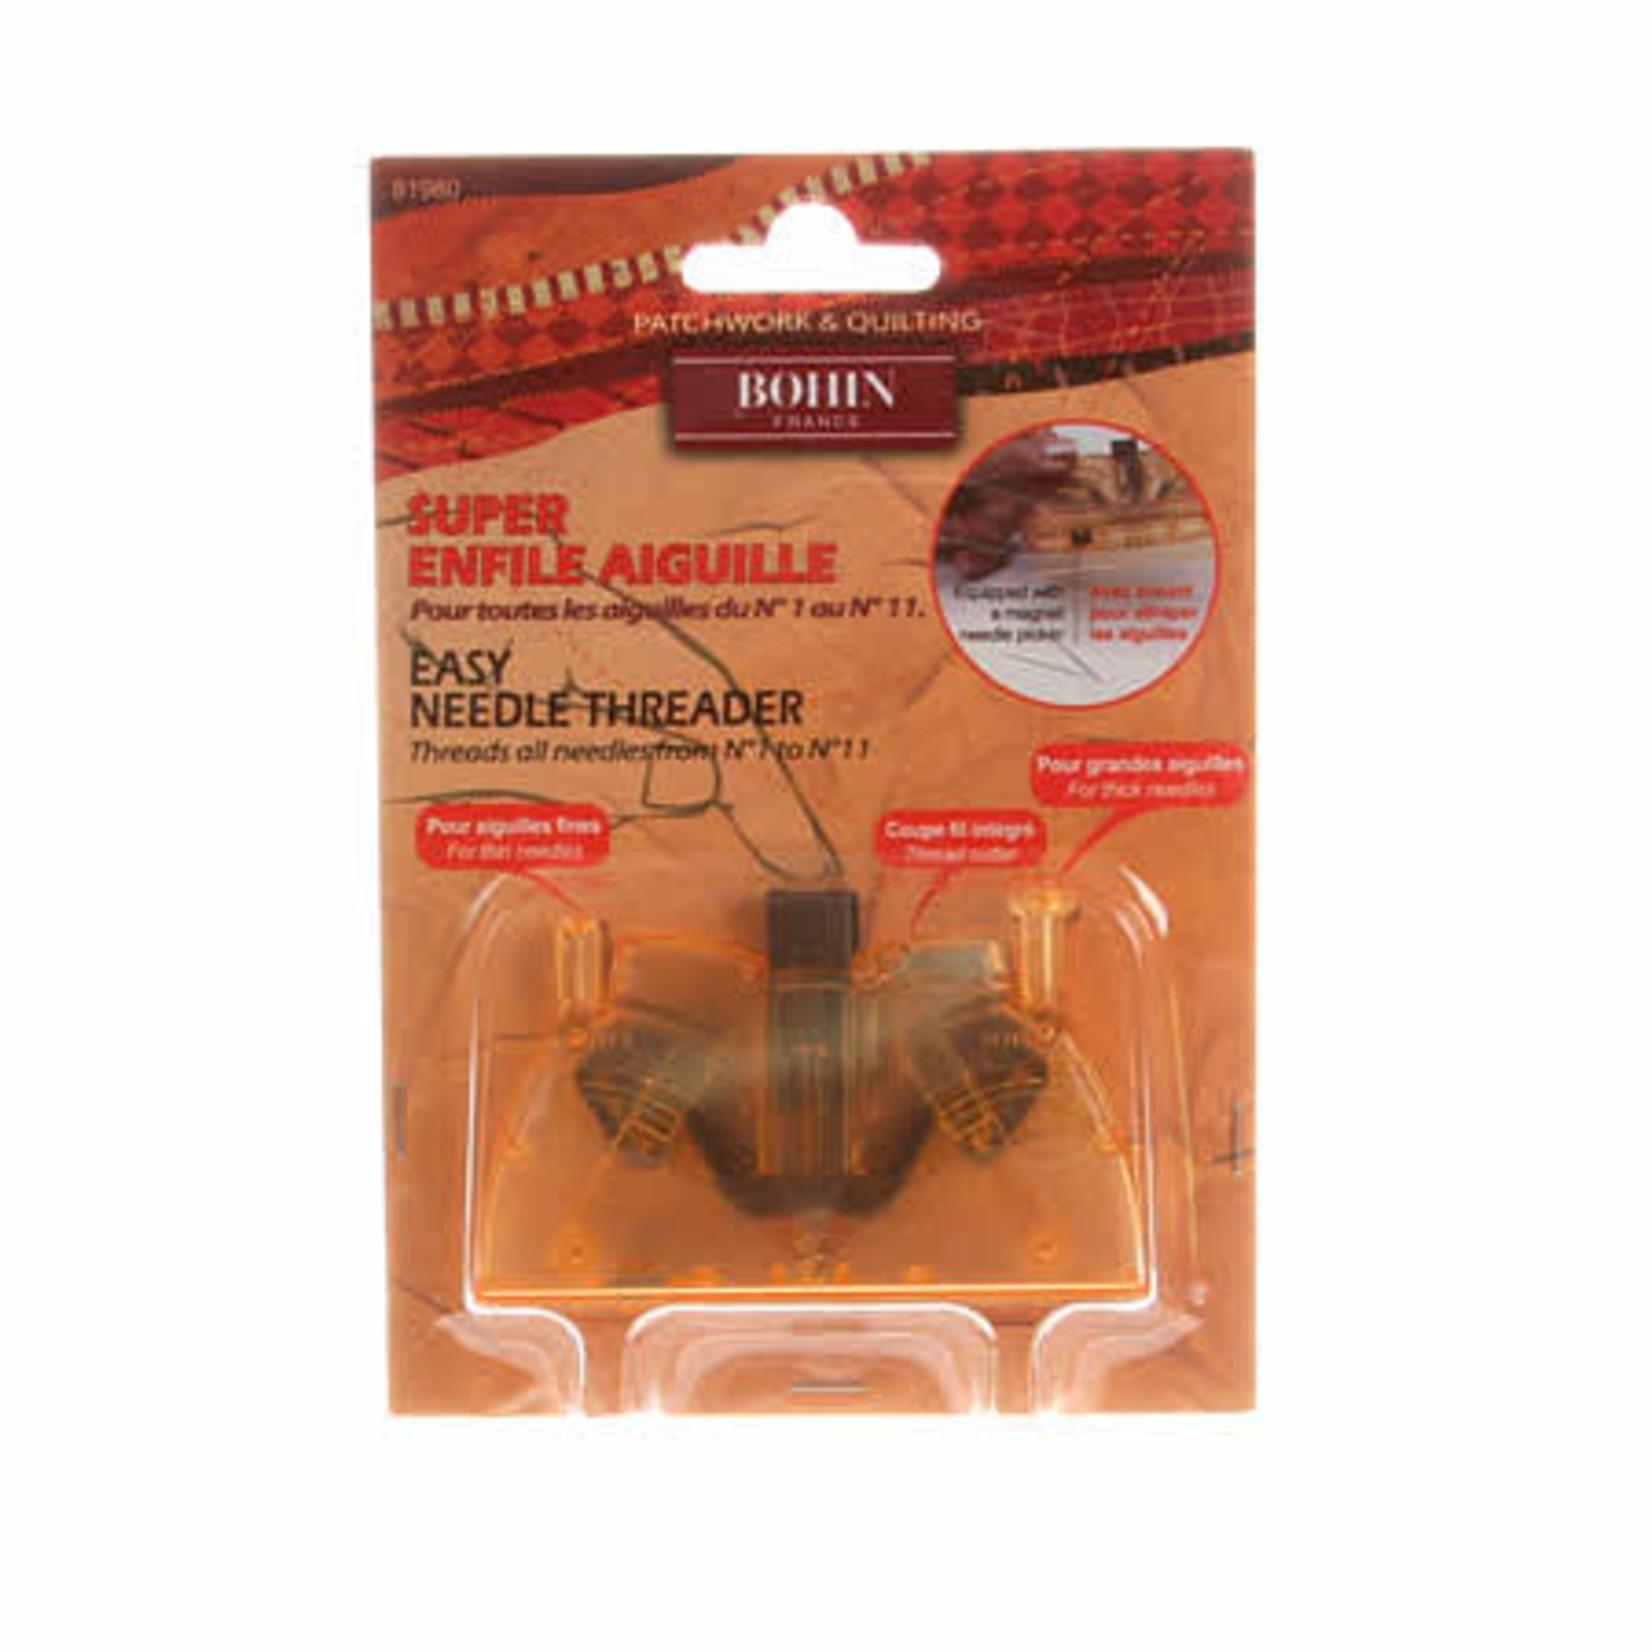 Bohin Super Needle Threader - hand needles